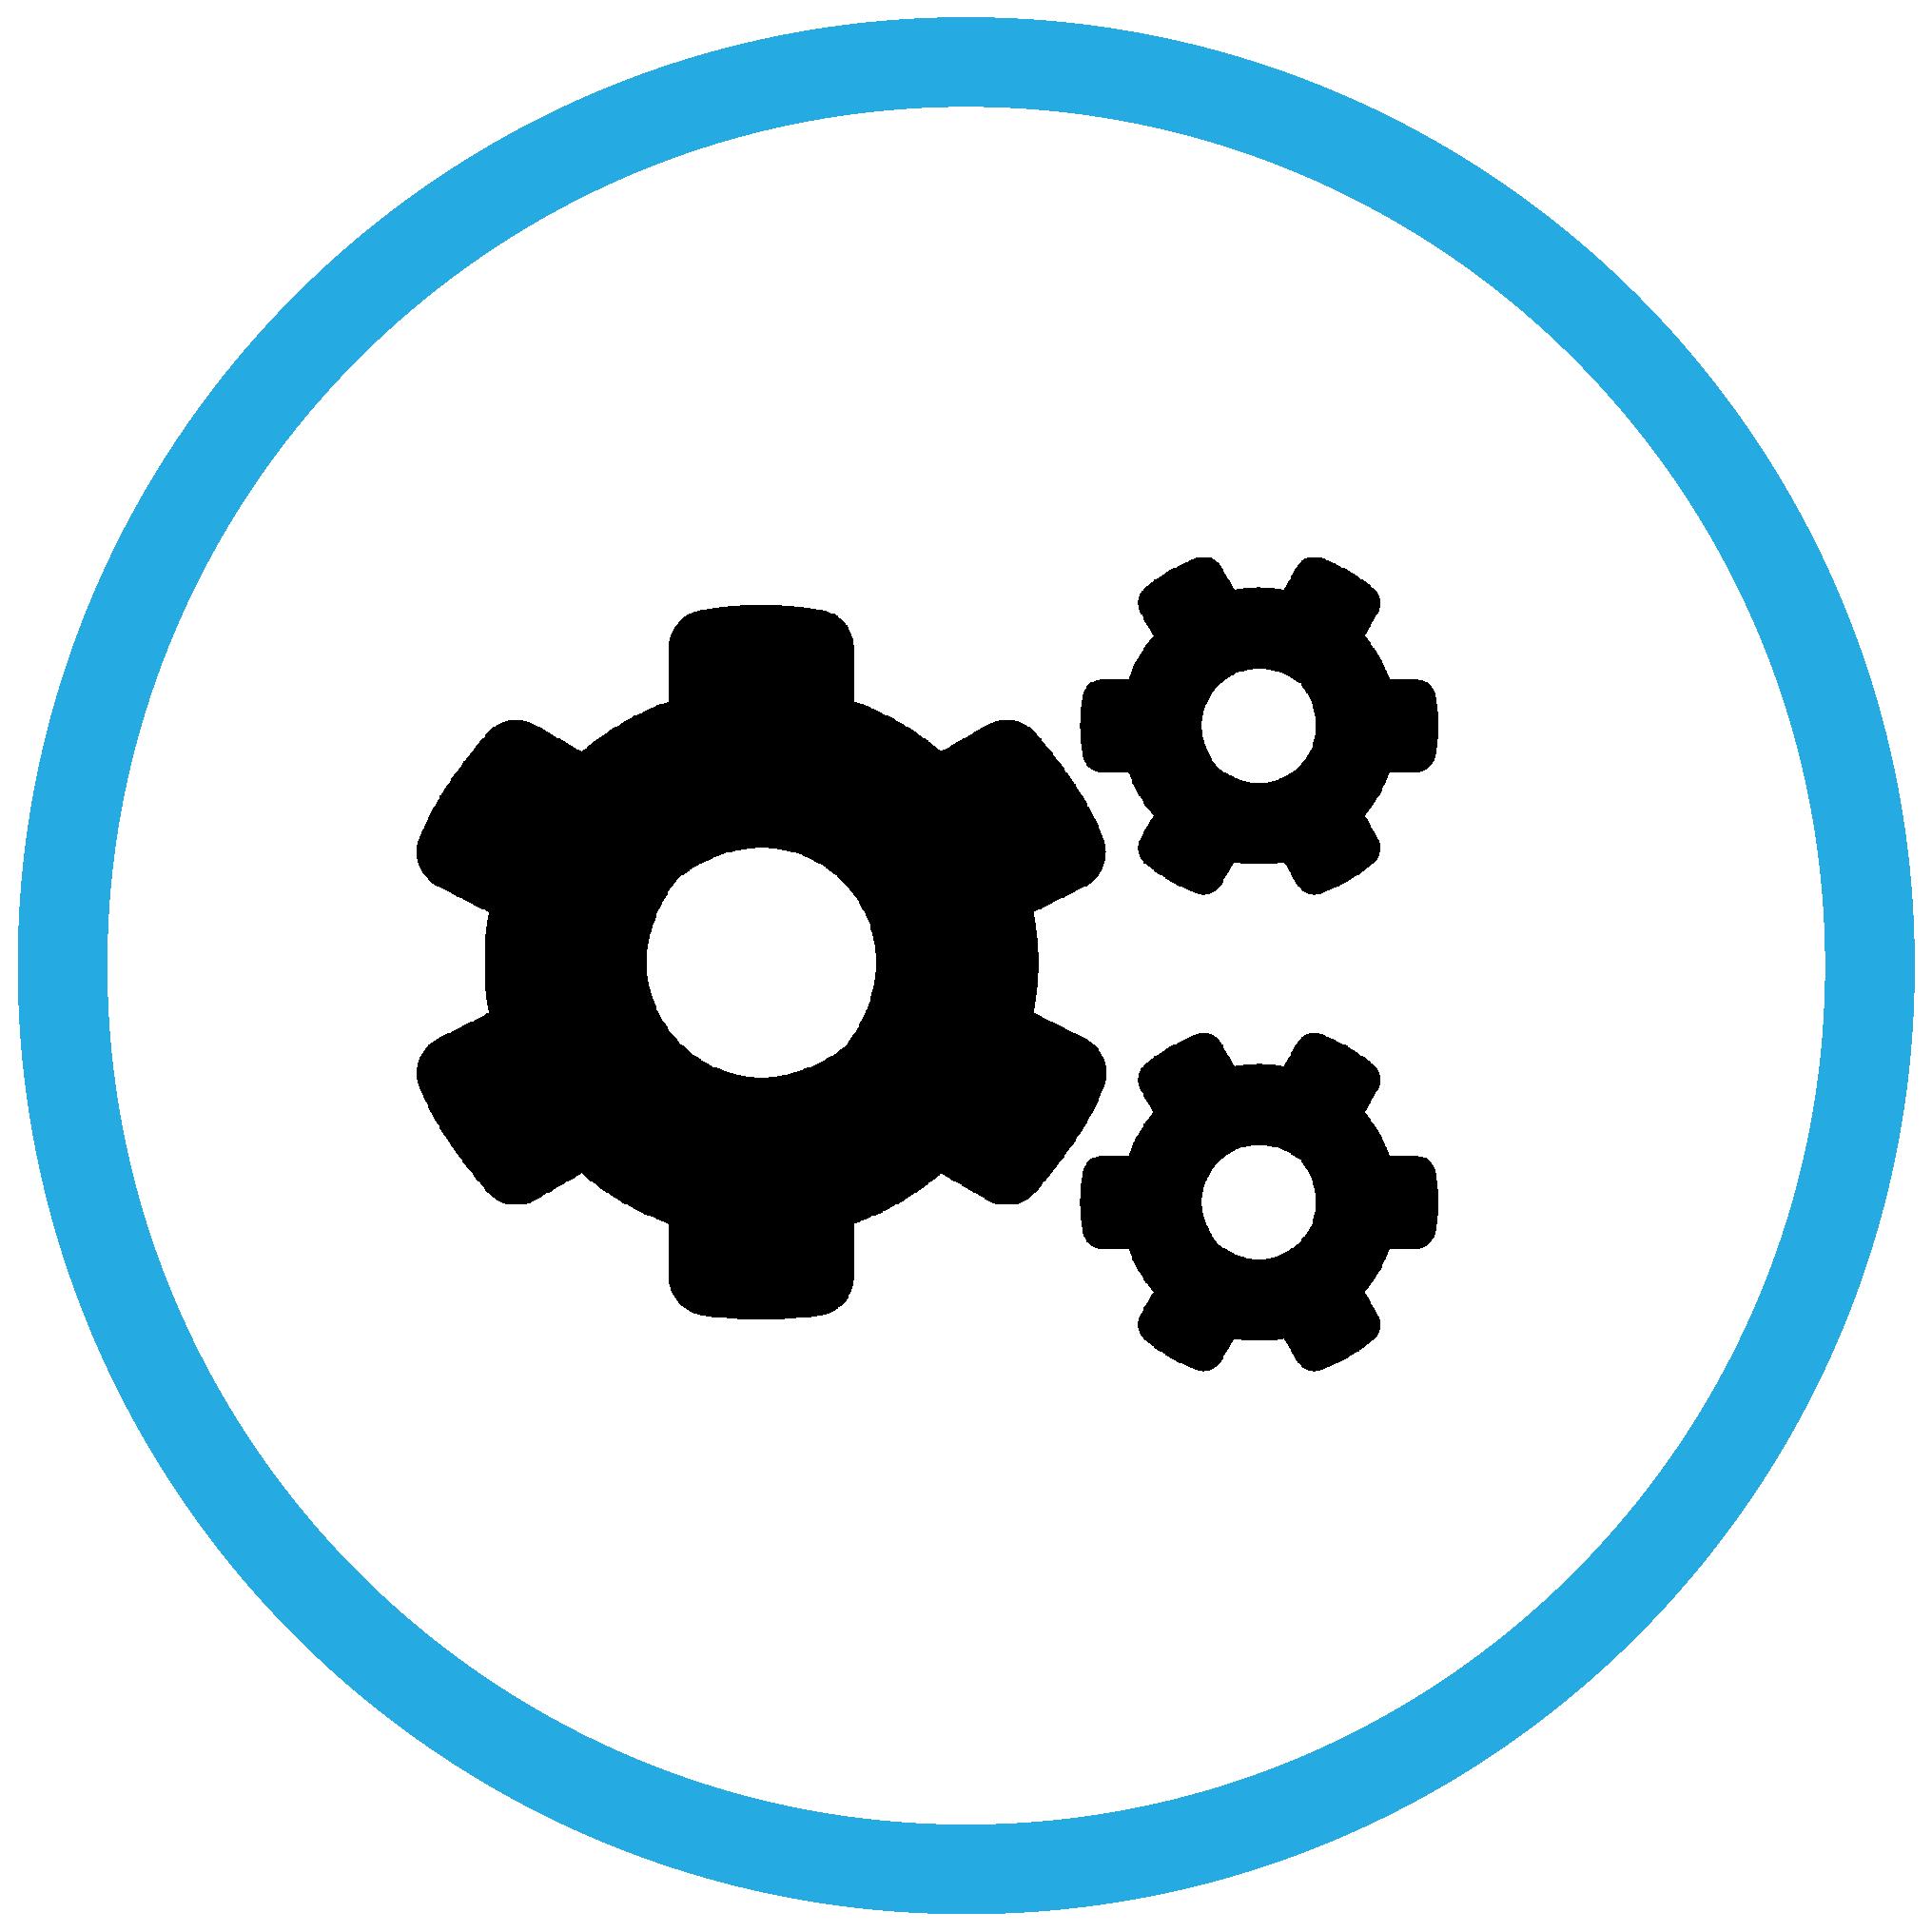 Unit 6 icon